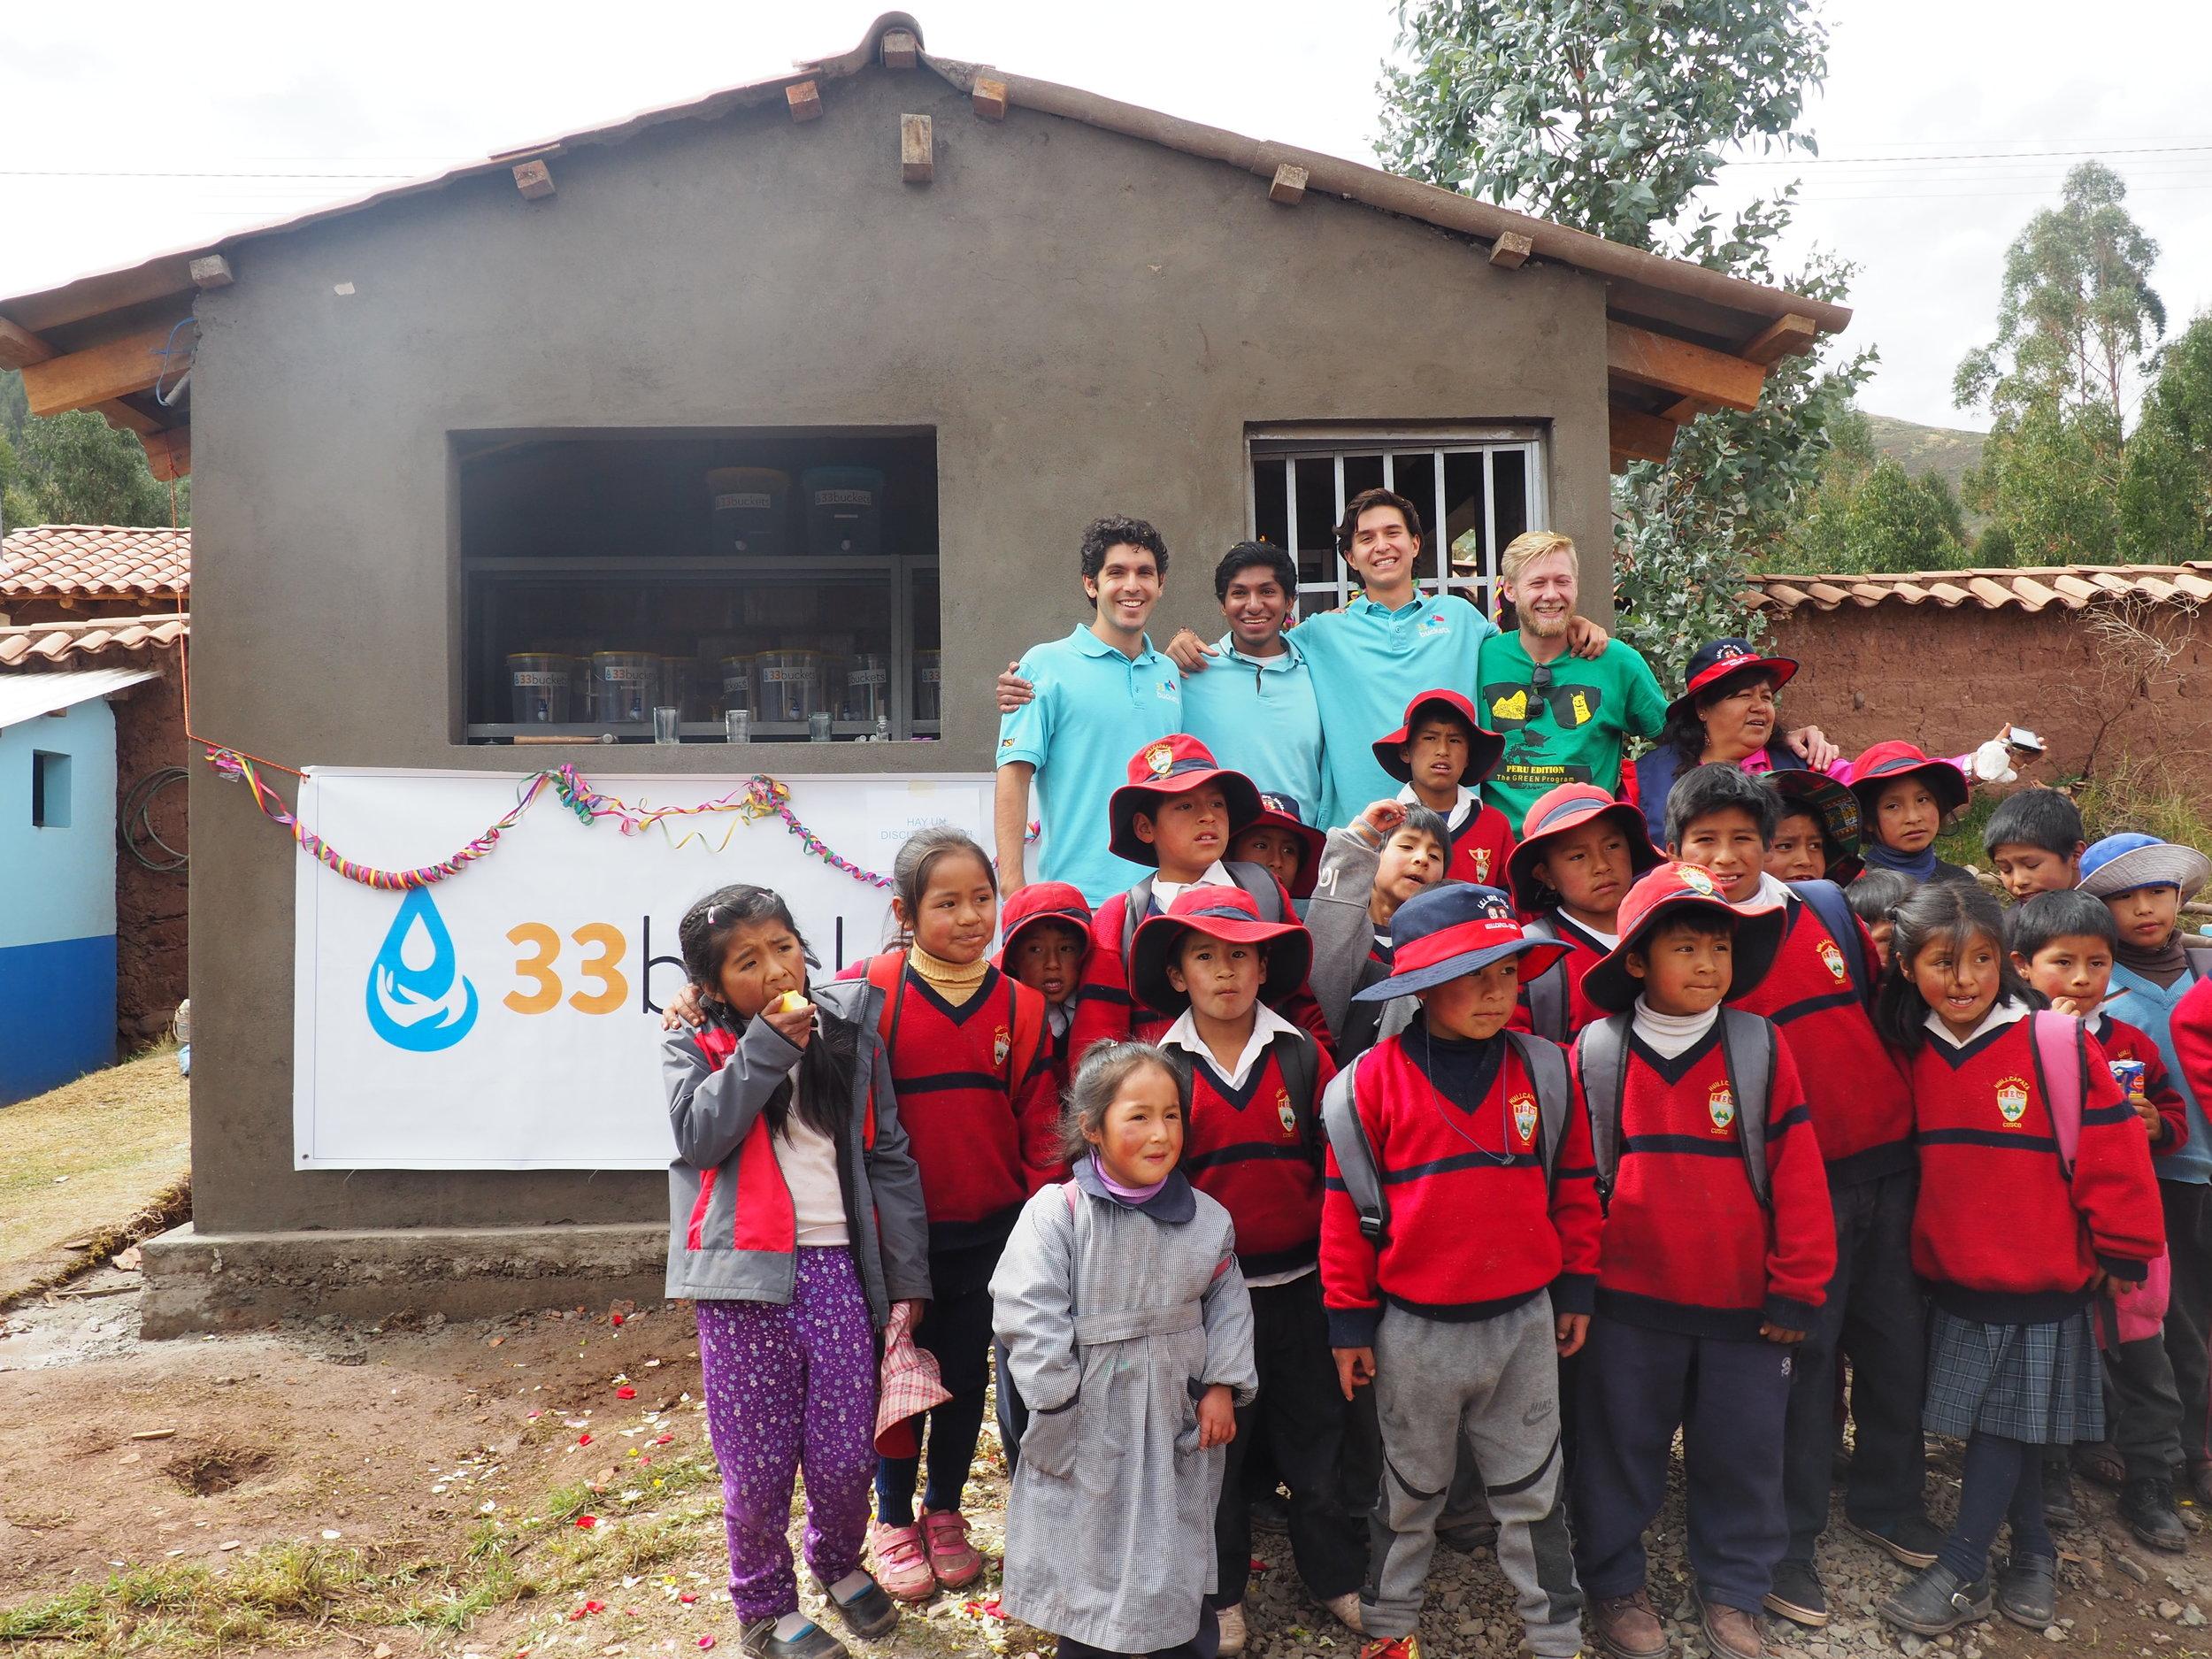 Huillcapata - Cusco, PeruJune 2016